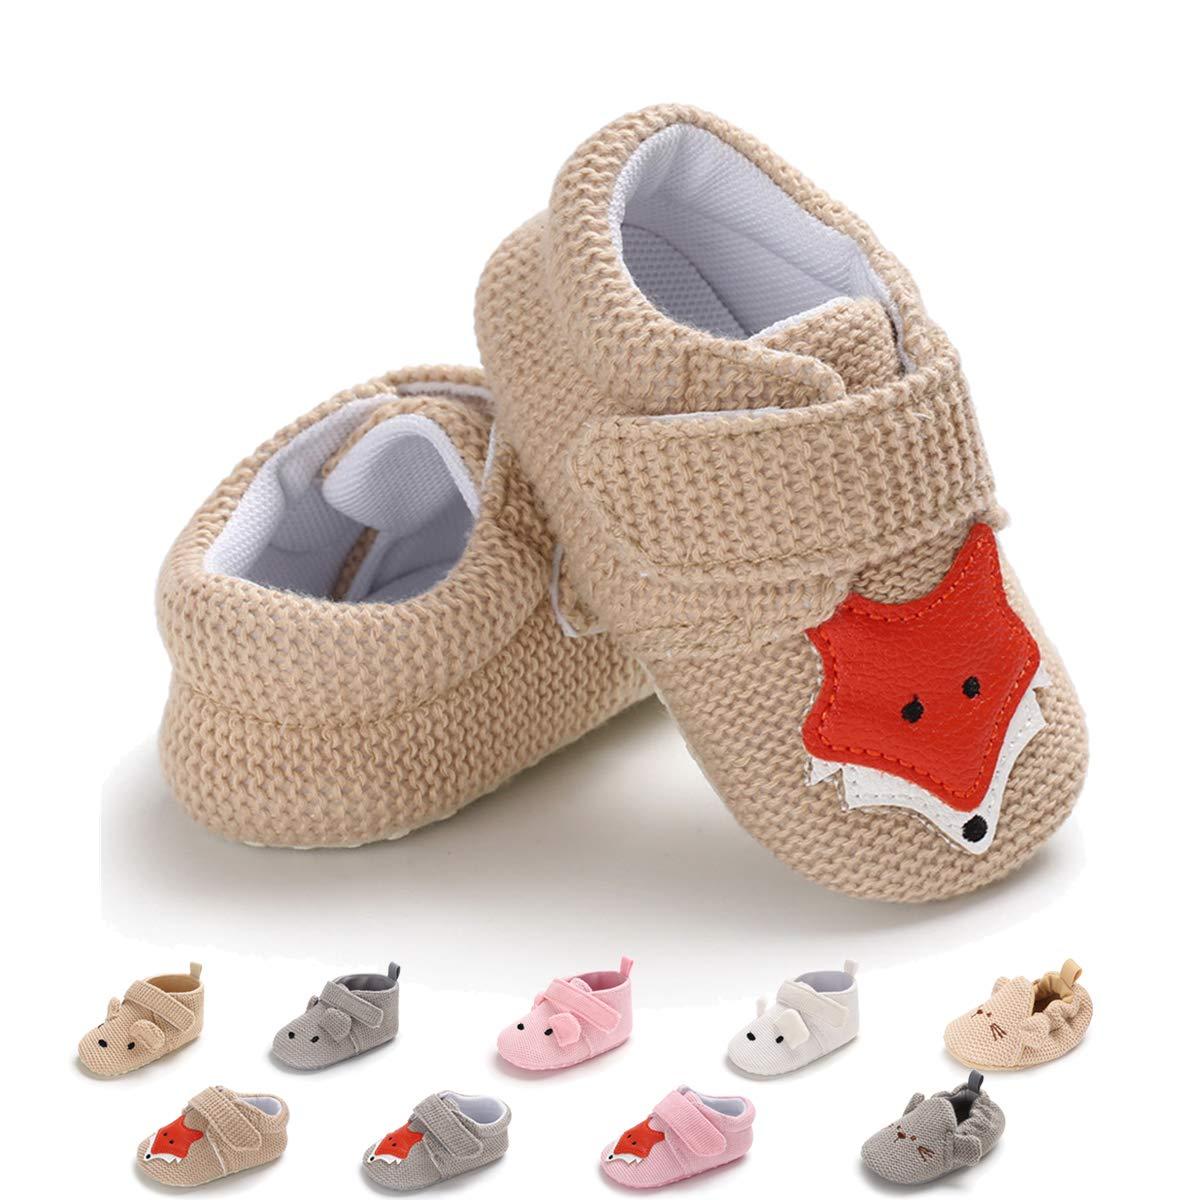 Sakuracan Infant Baby Boys Girls Slippers Cozy